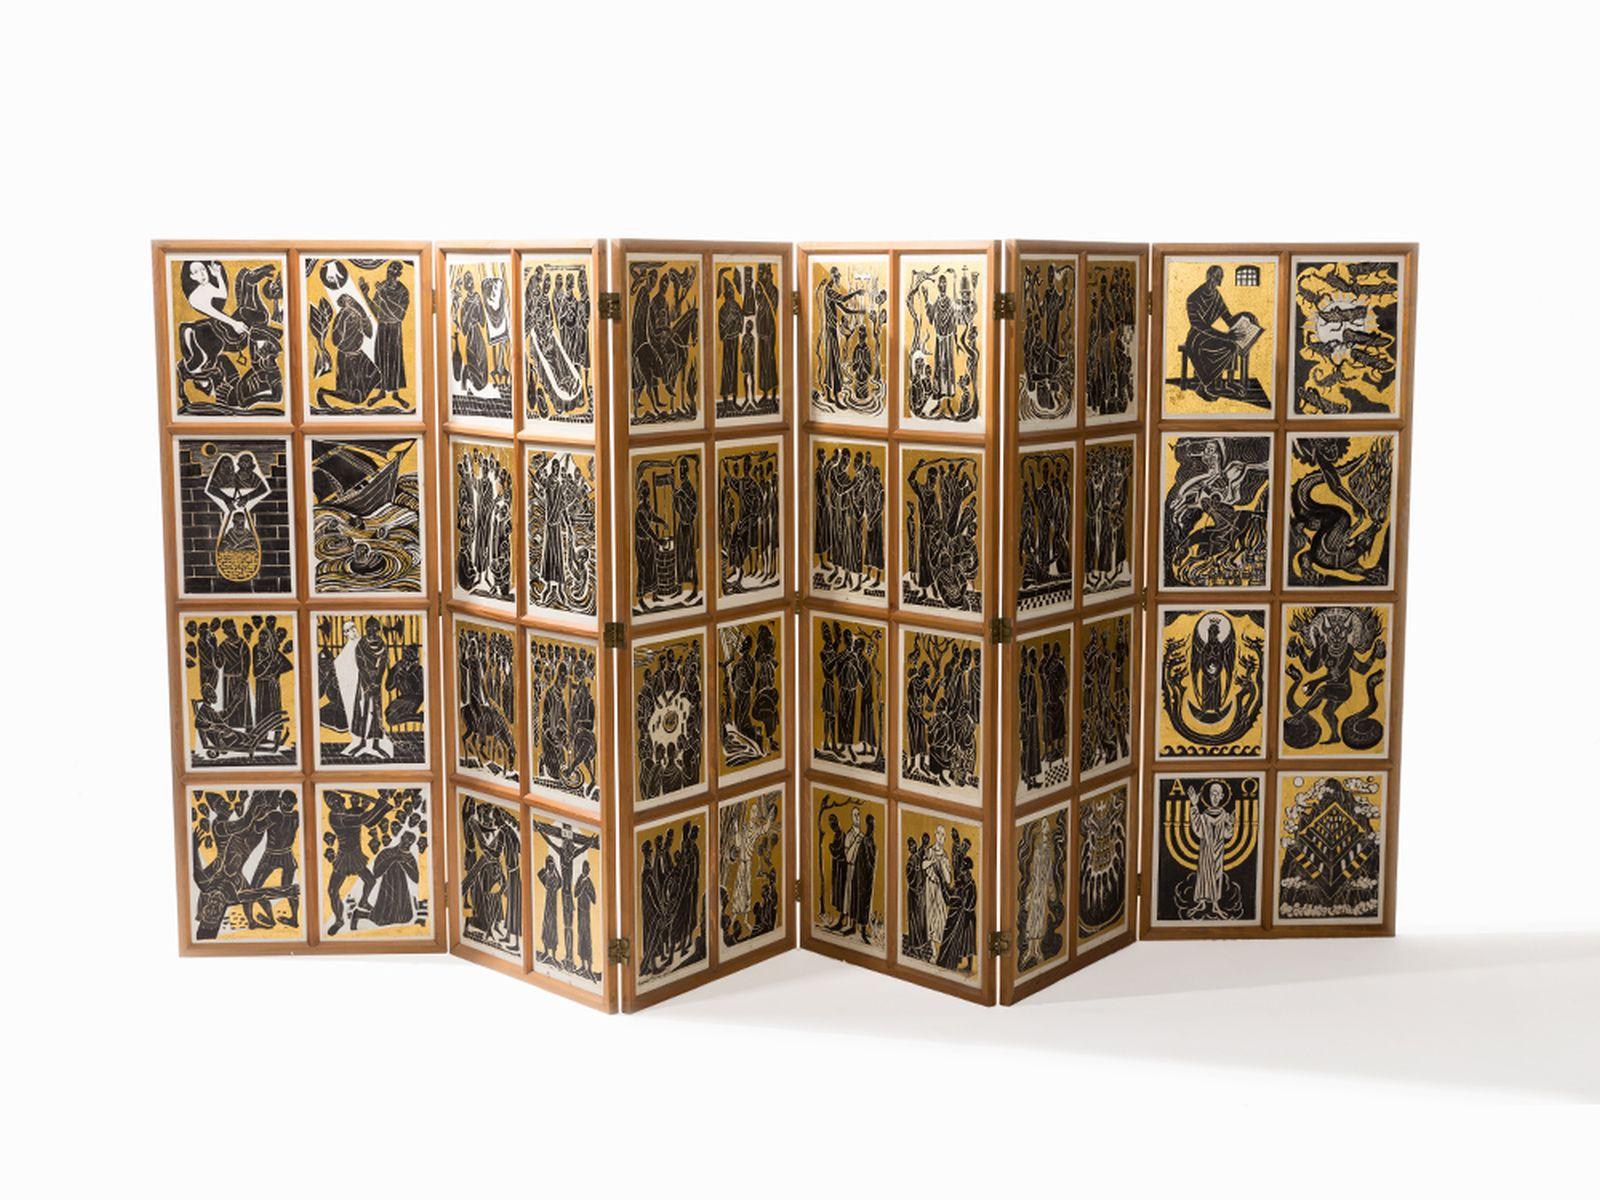 "#128 Egon Stolterfoh t""Altar with Biblical Scenes"" c. 1970 | Egon Stolterfoht (*1912-1986) ""Altar mit Szene aus dem Leben Christi"" ca. 1970 Image"